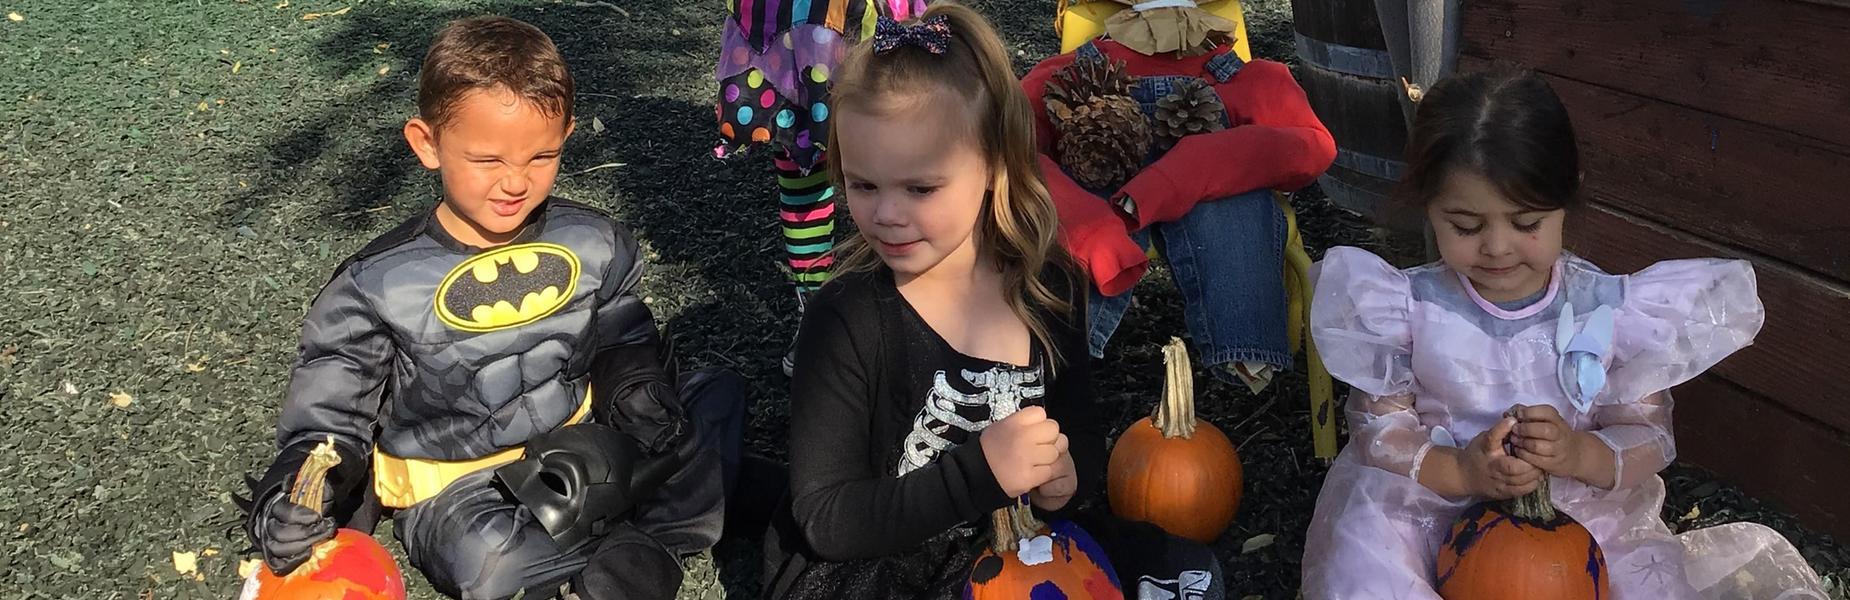 preschoolers and pumpkins